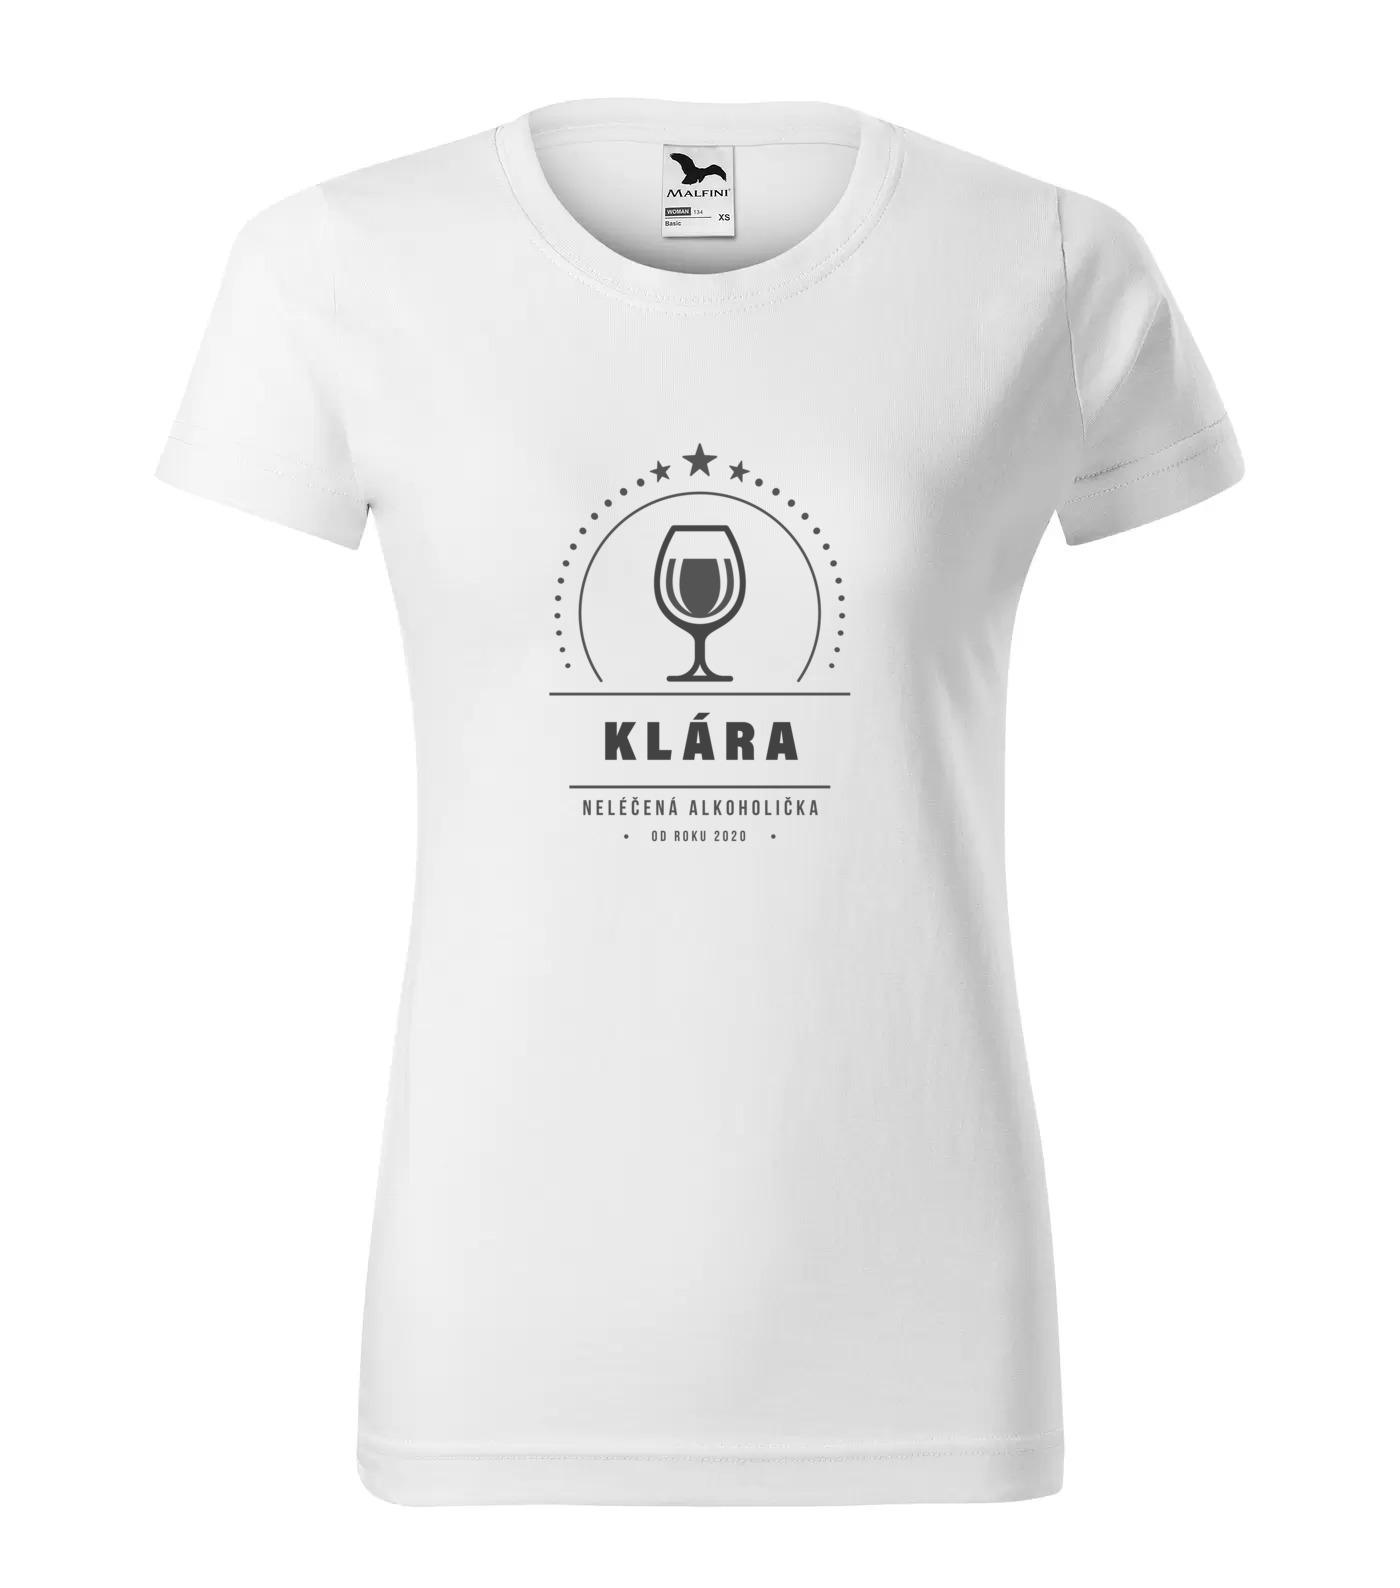 Tričko Alkoholička Klára